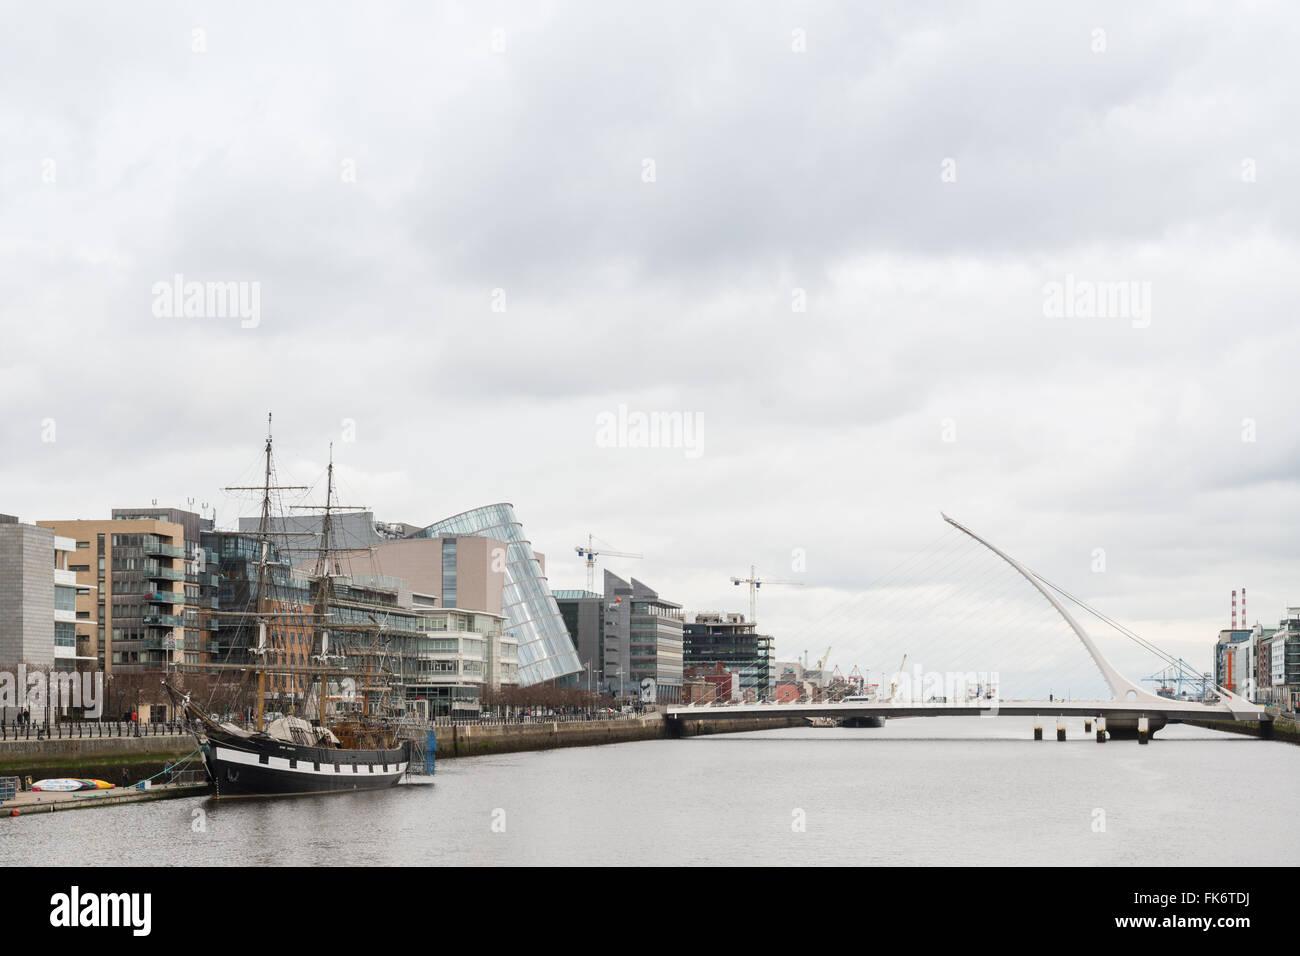 Dublin Docklands - Stock Image